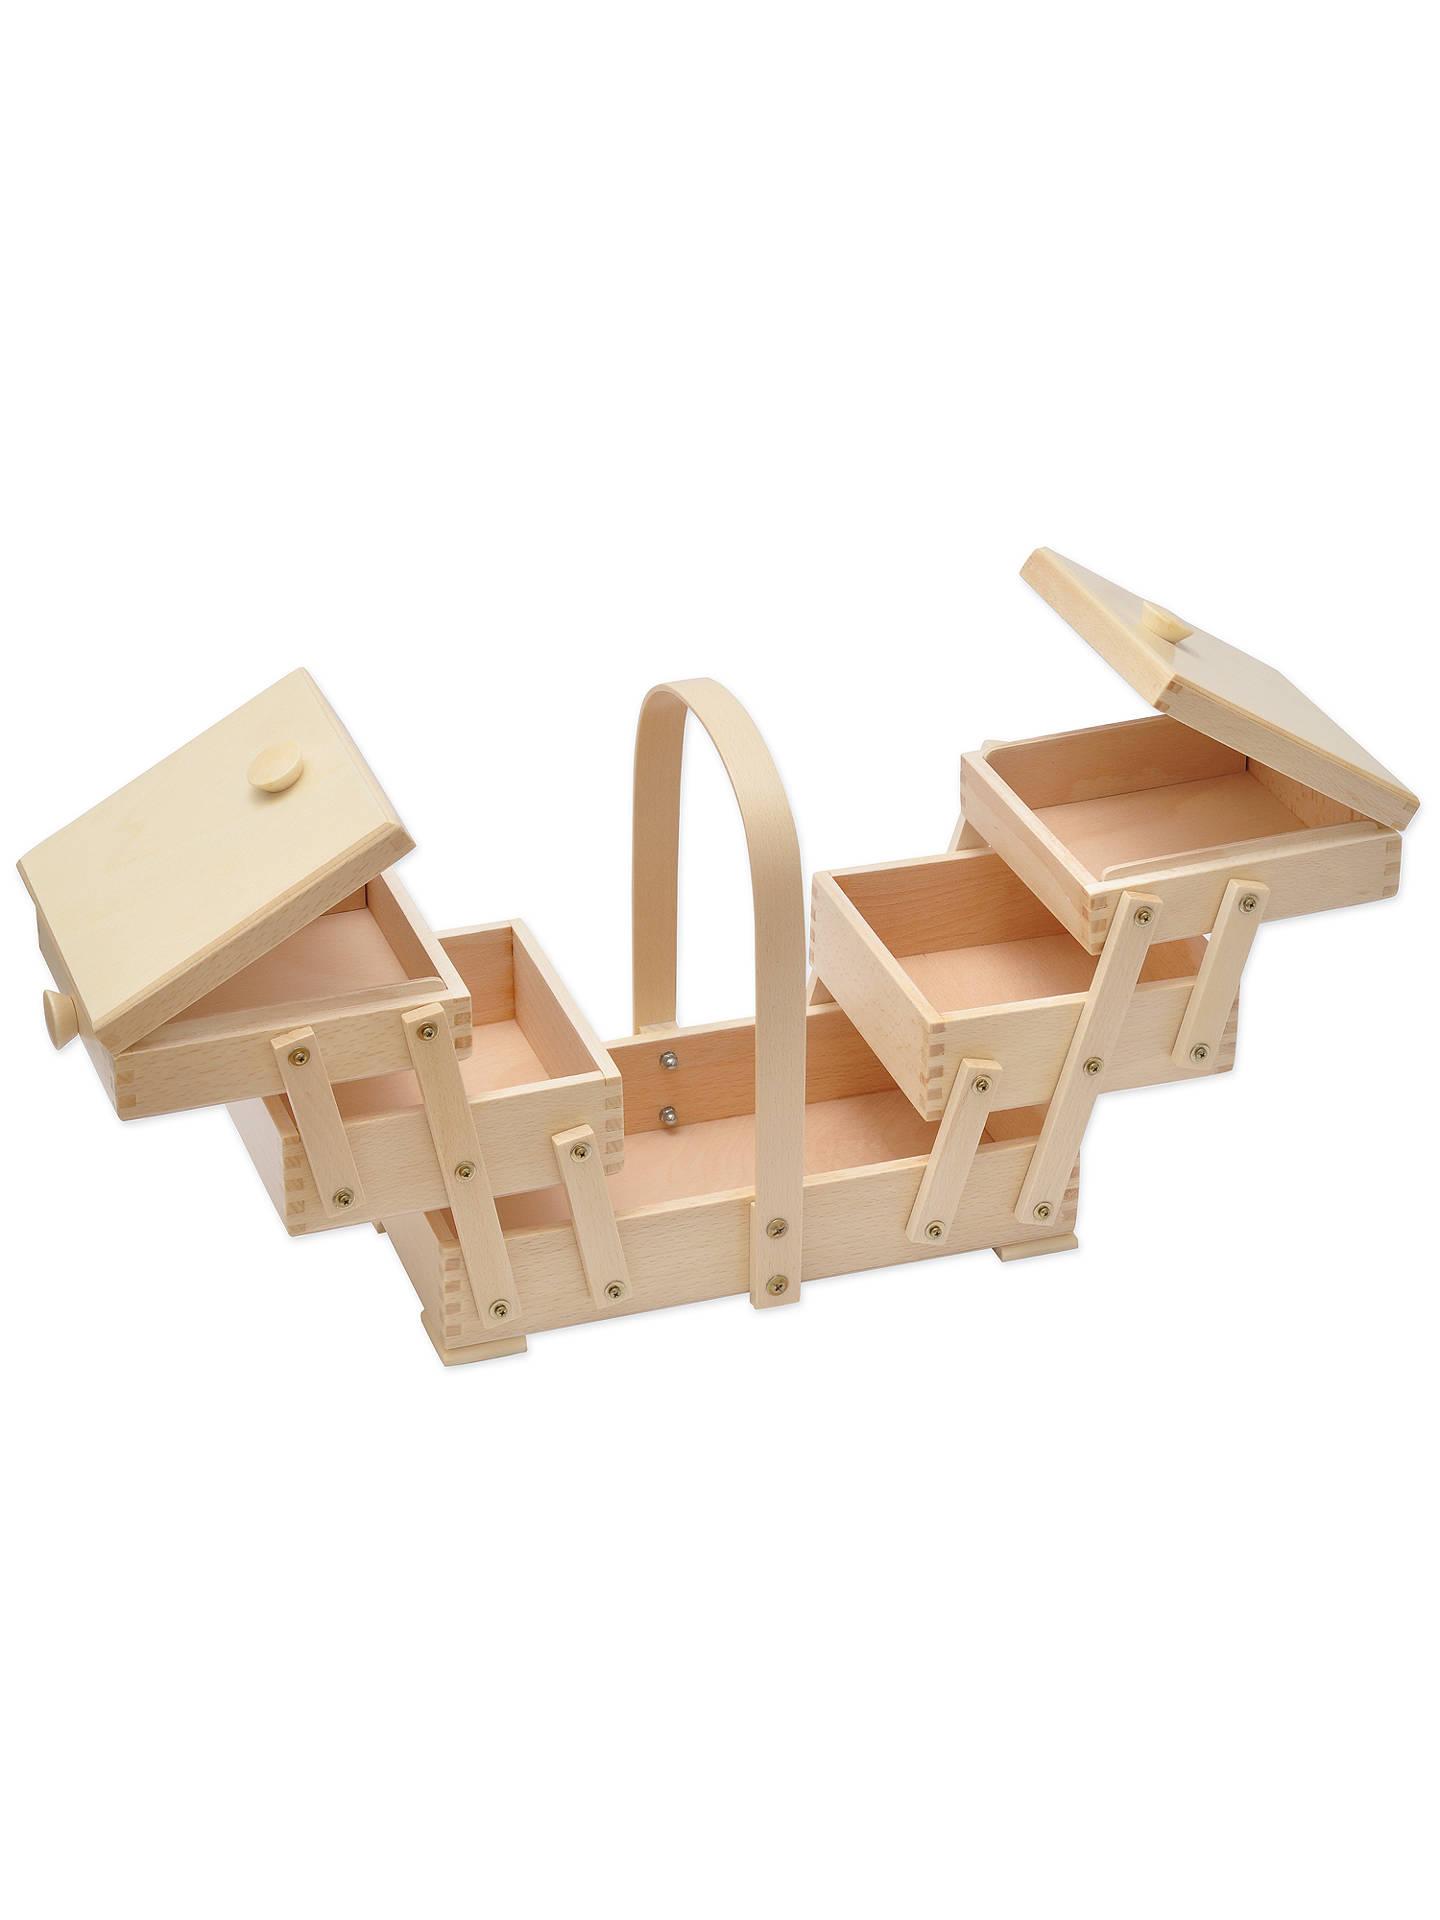 Brown Aumuller Korbwaren AUMUL Sewing Box with Beech Wood